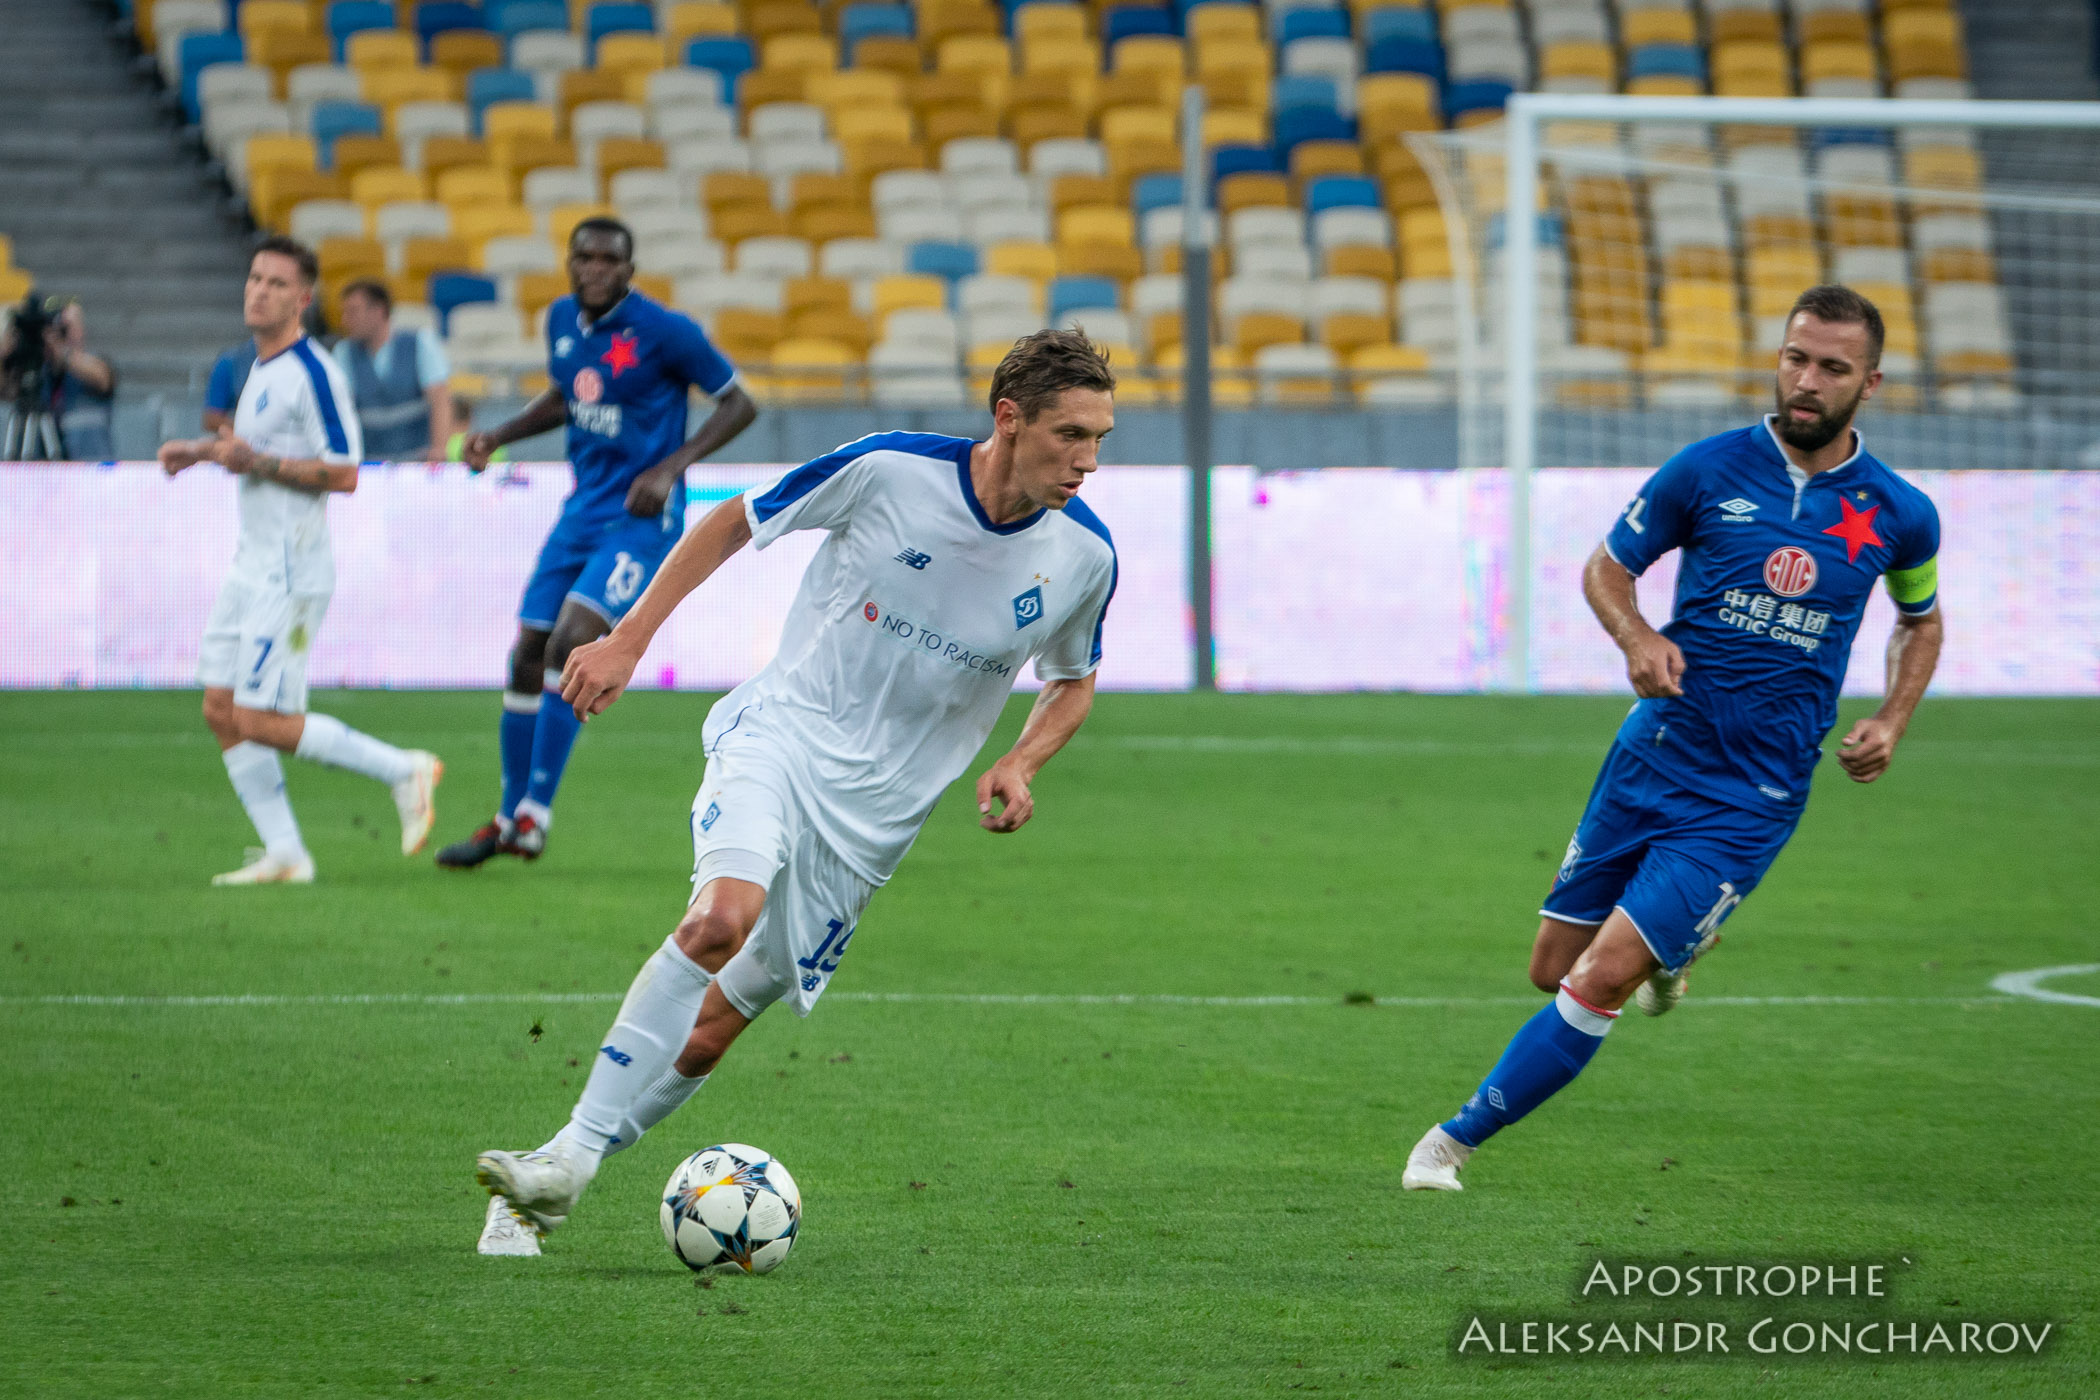 Лига чемпионов онлайн плейофф динамо киев боруссия